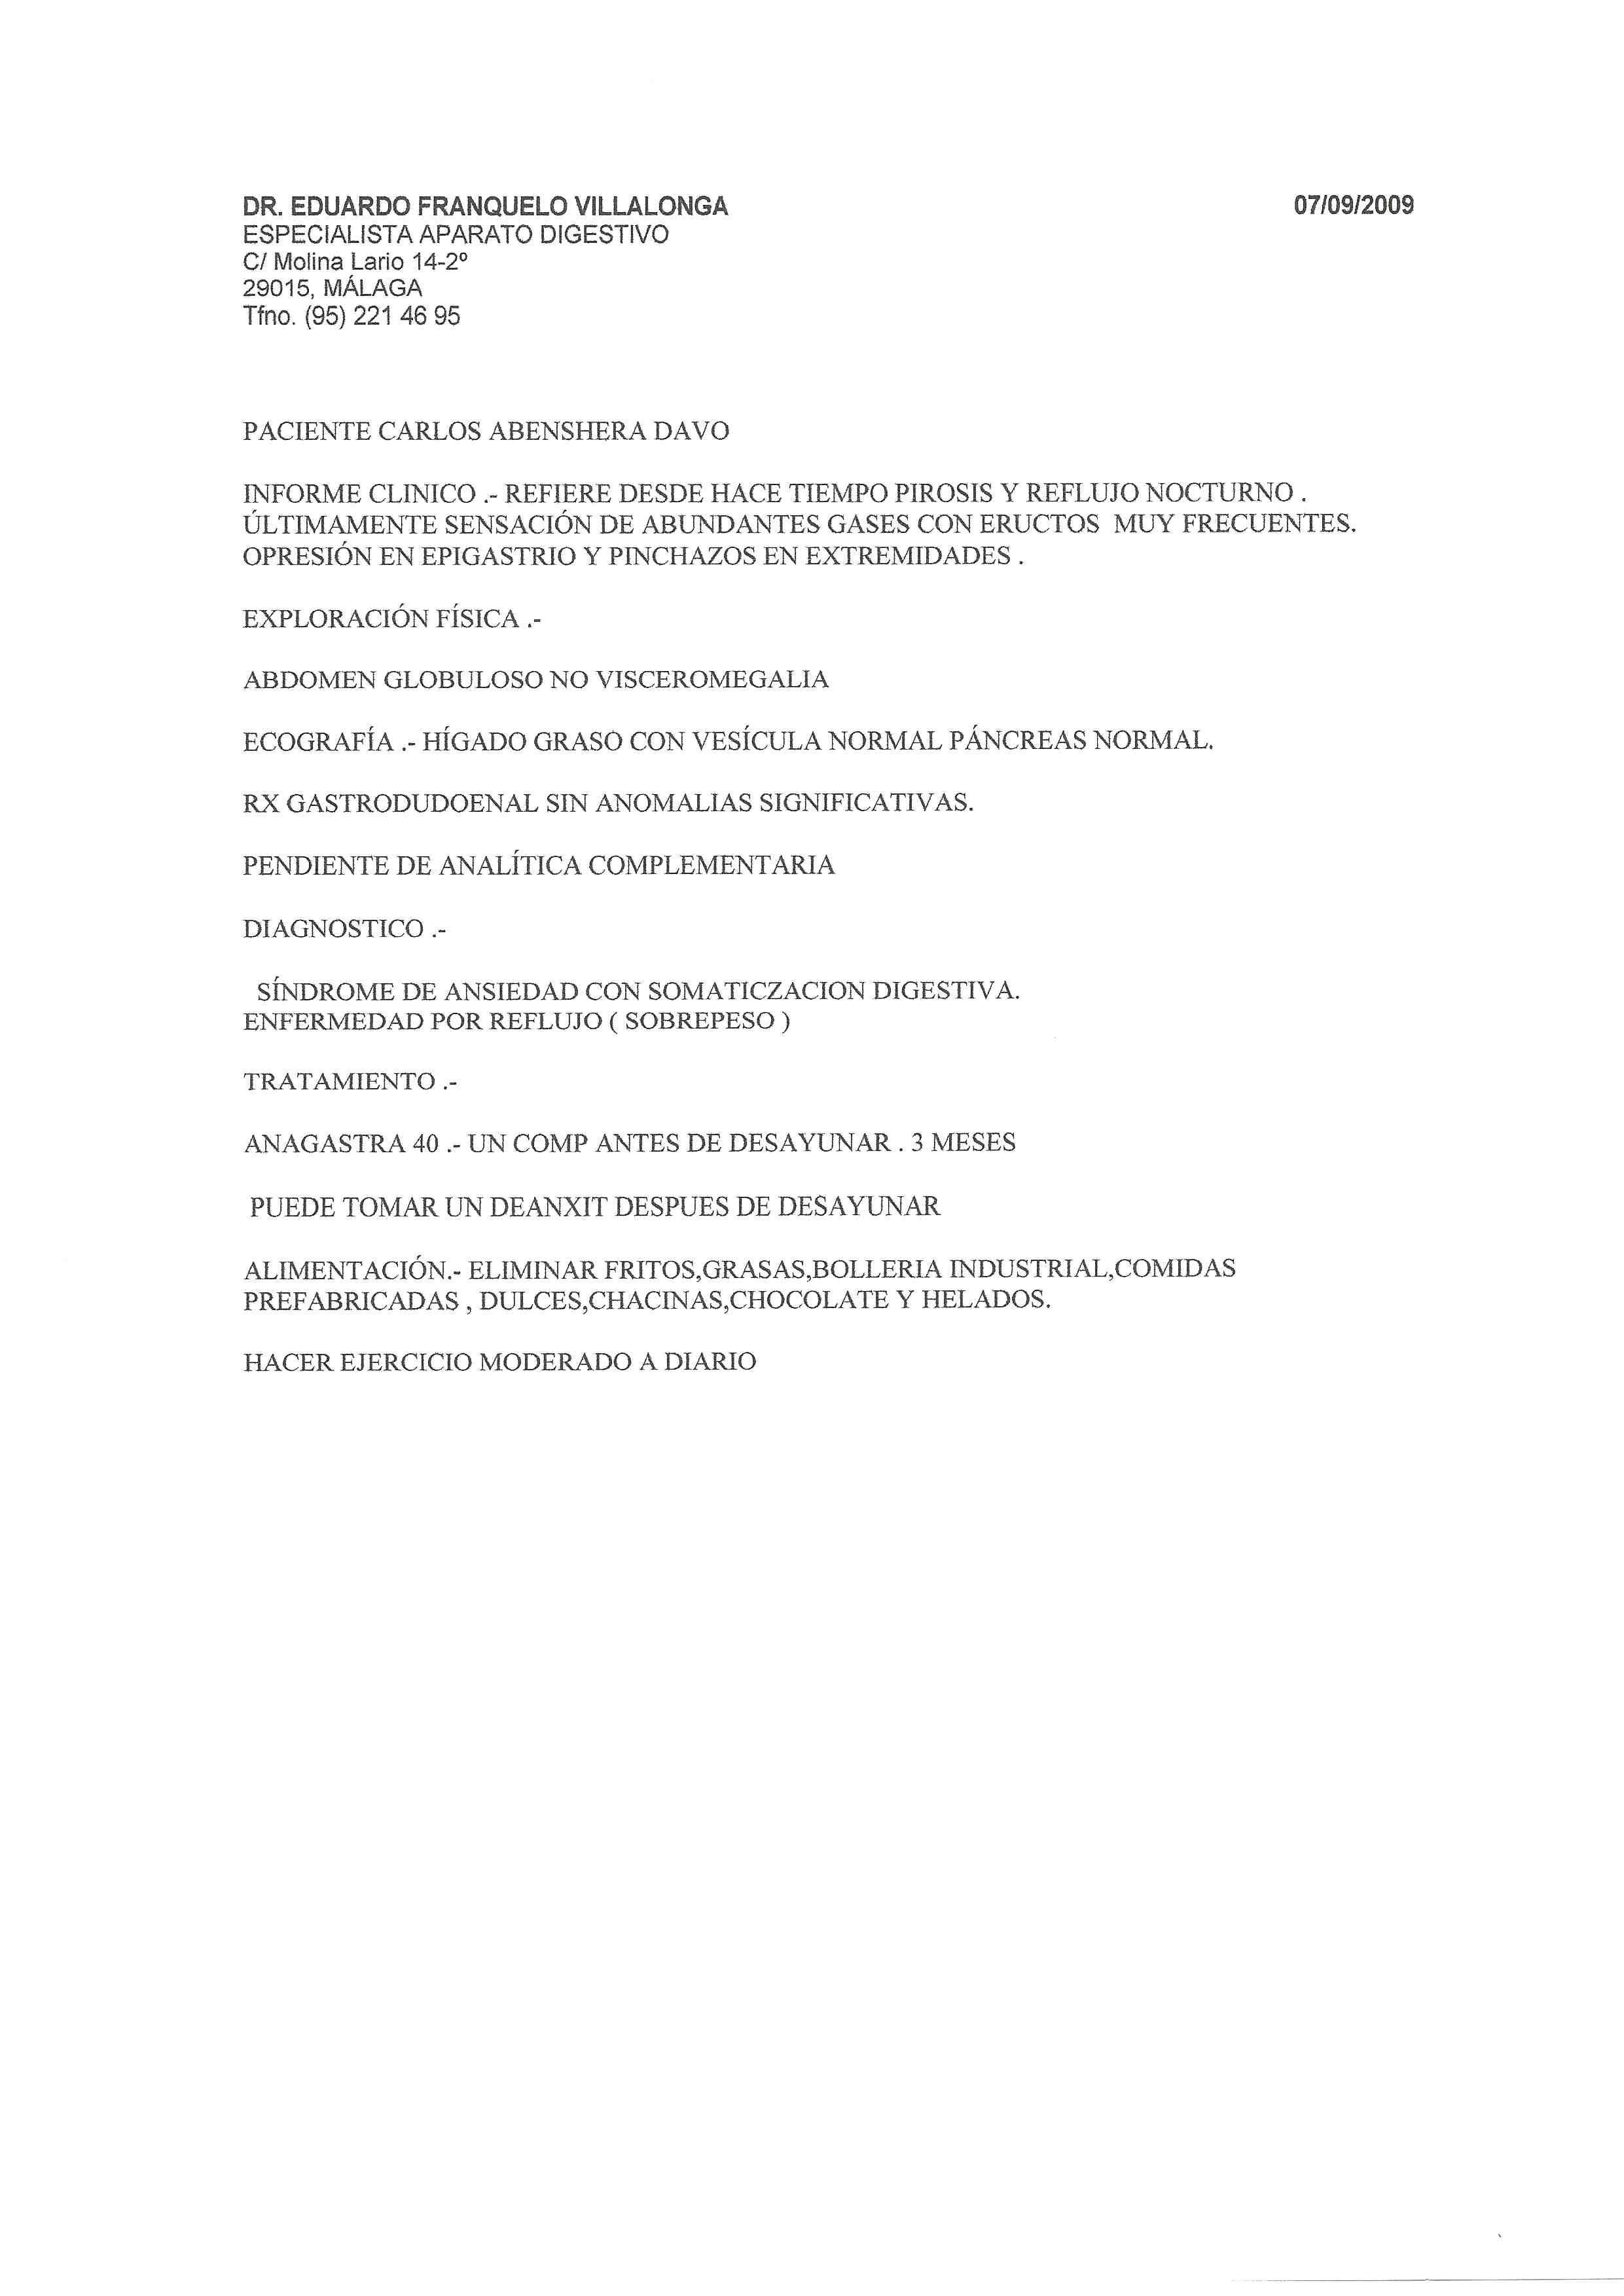 5 - 7 Septiembre 2009 - Digestivo 2